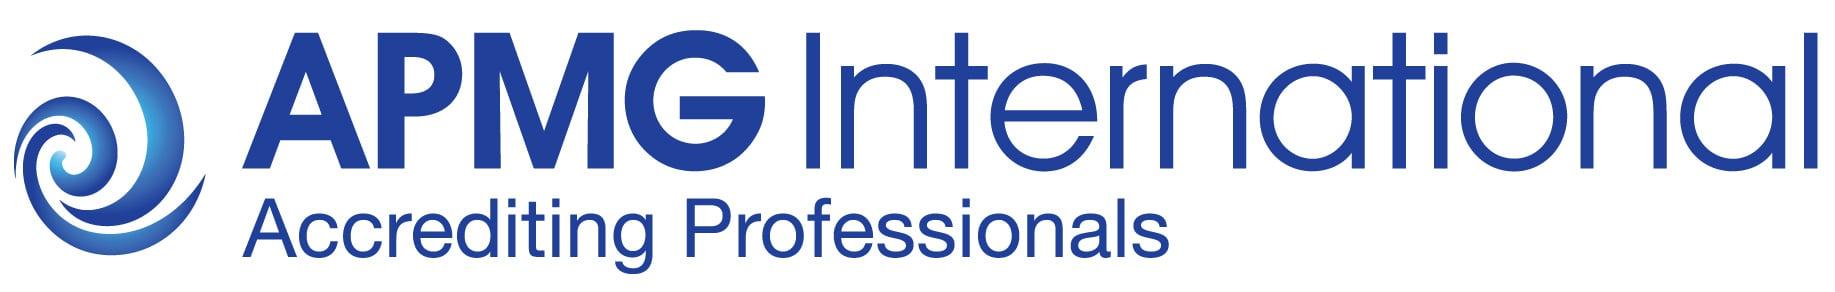 APMG International Logo